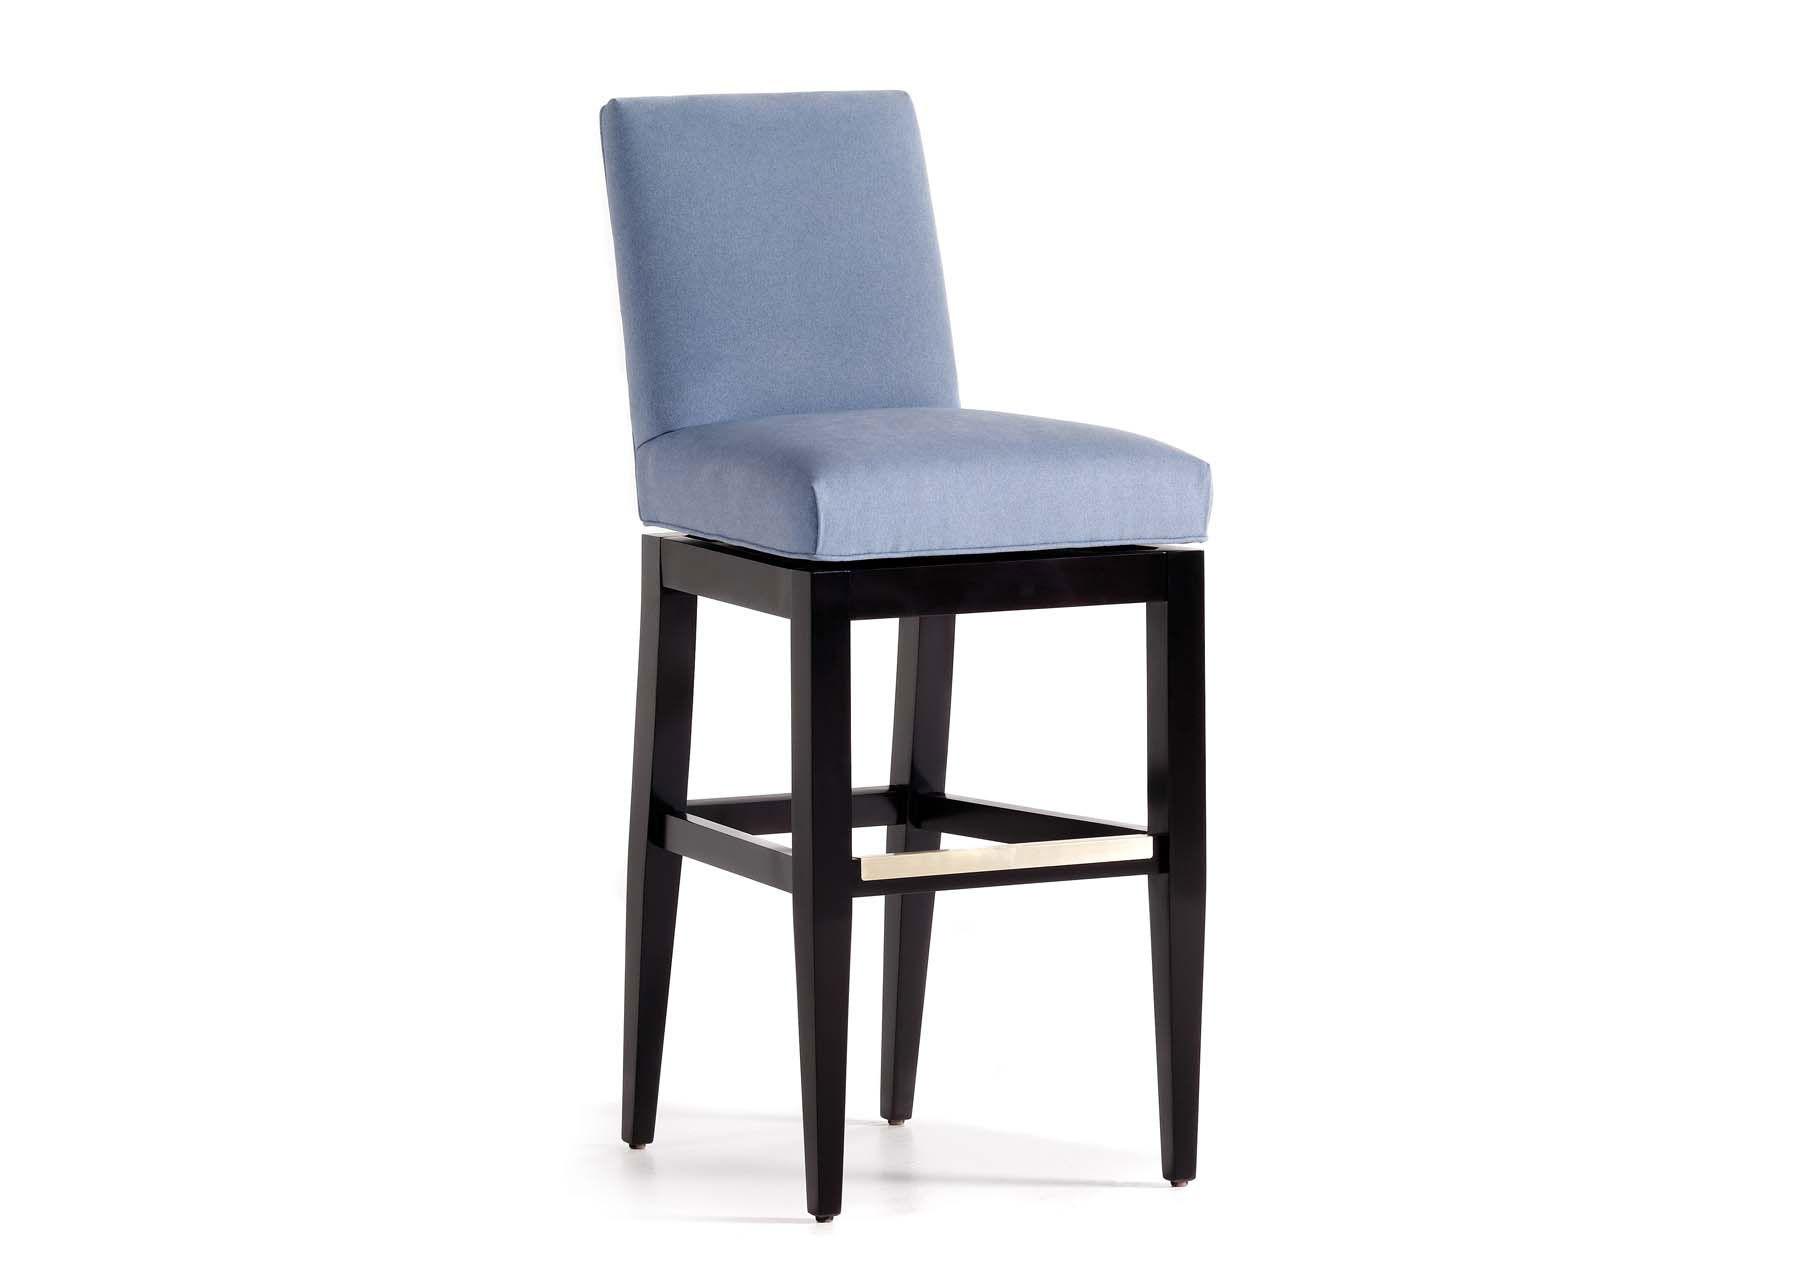 Cabot Wrenn Ridge Swivel Furniture And Accessories